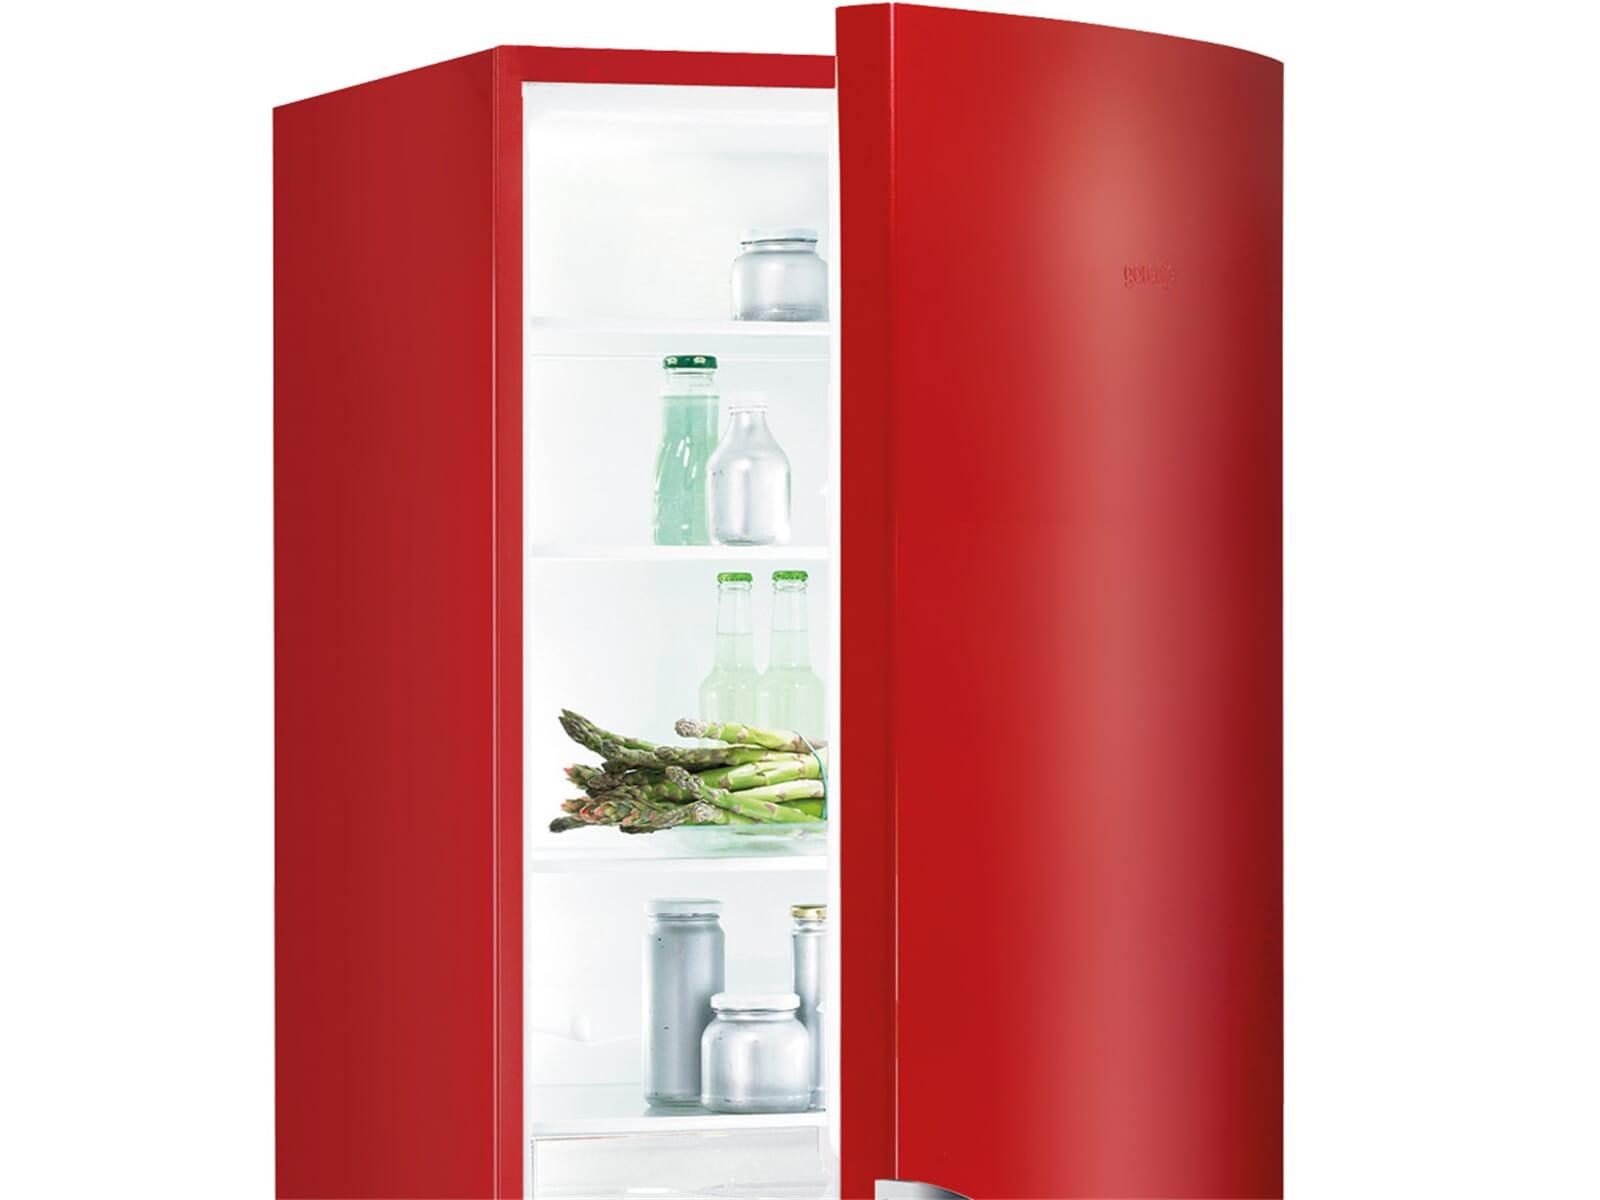 Gorenje Kühlschrank Rot : Gorenje kühlschrank gefrierkombination kühl gefrierkombination